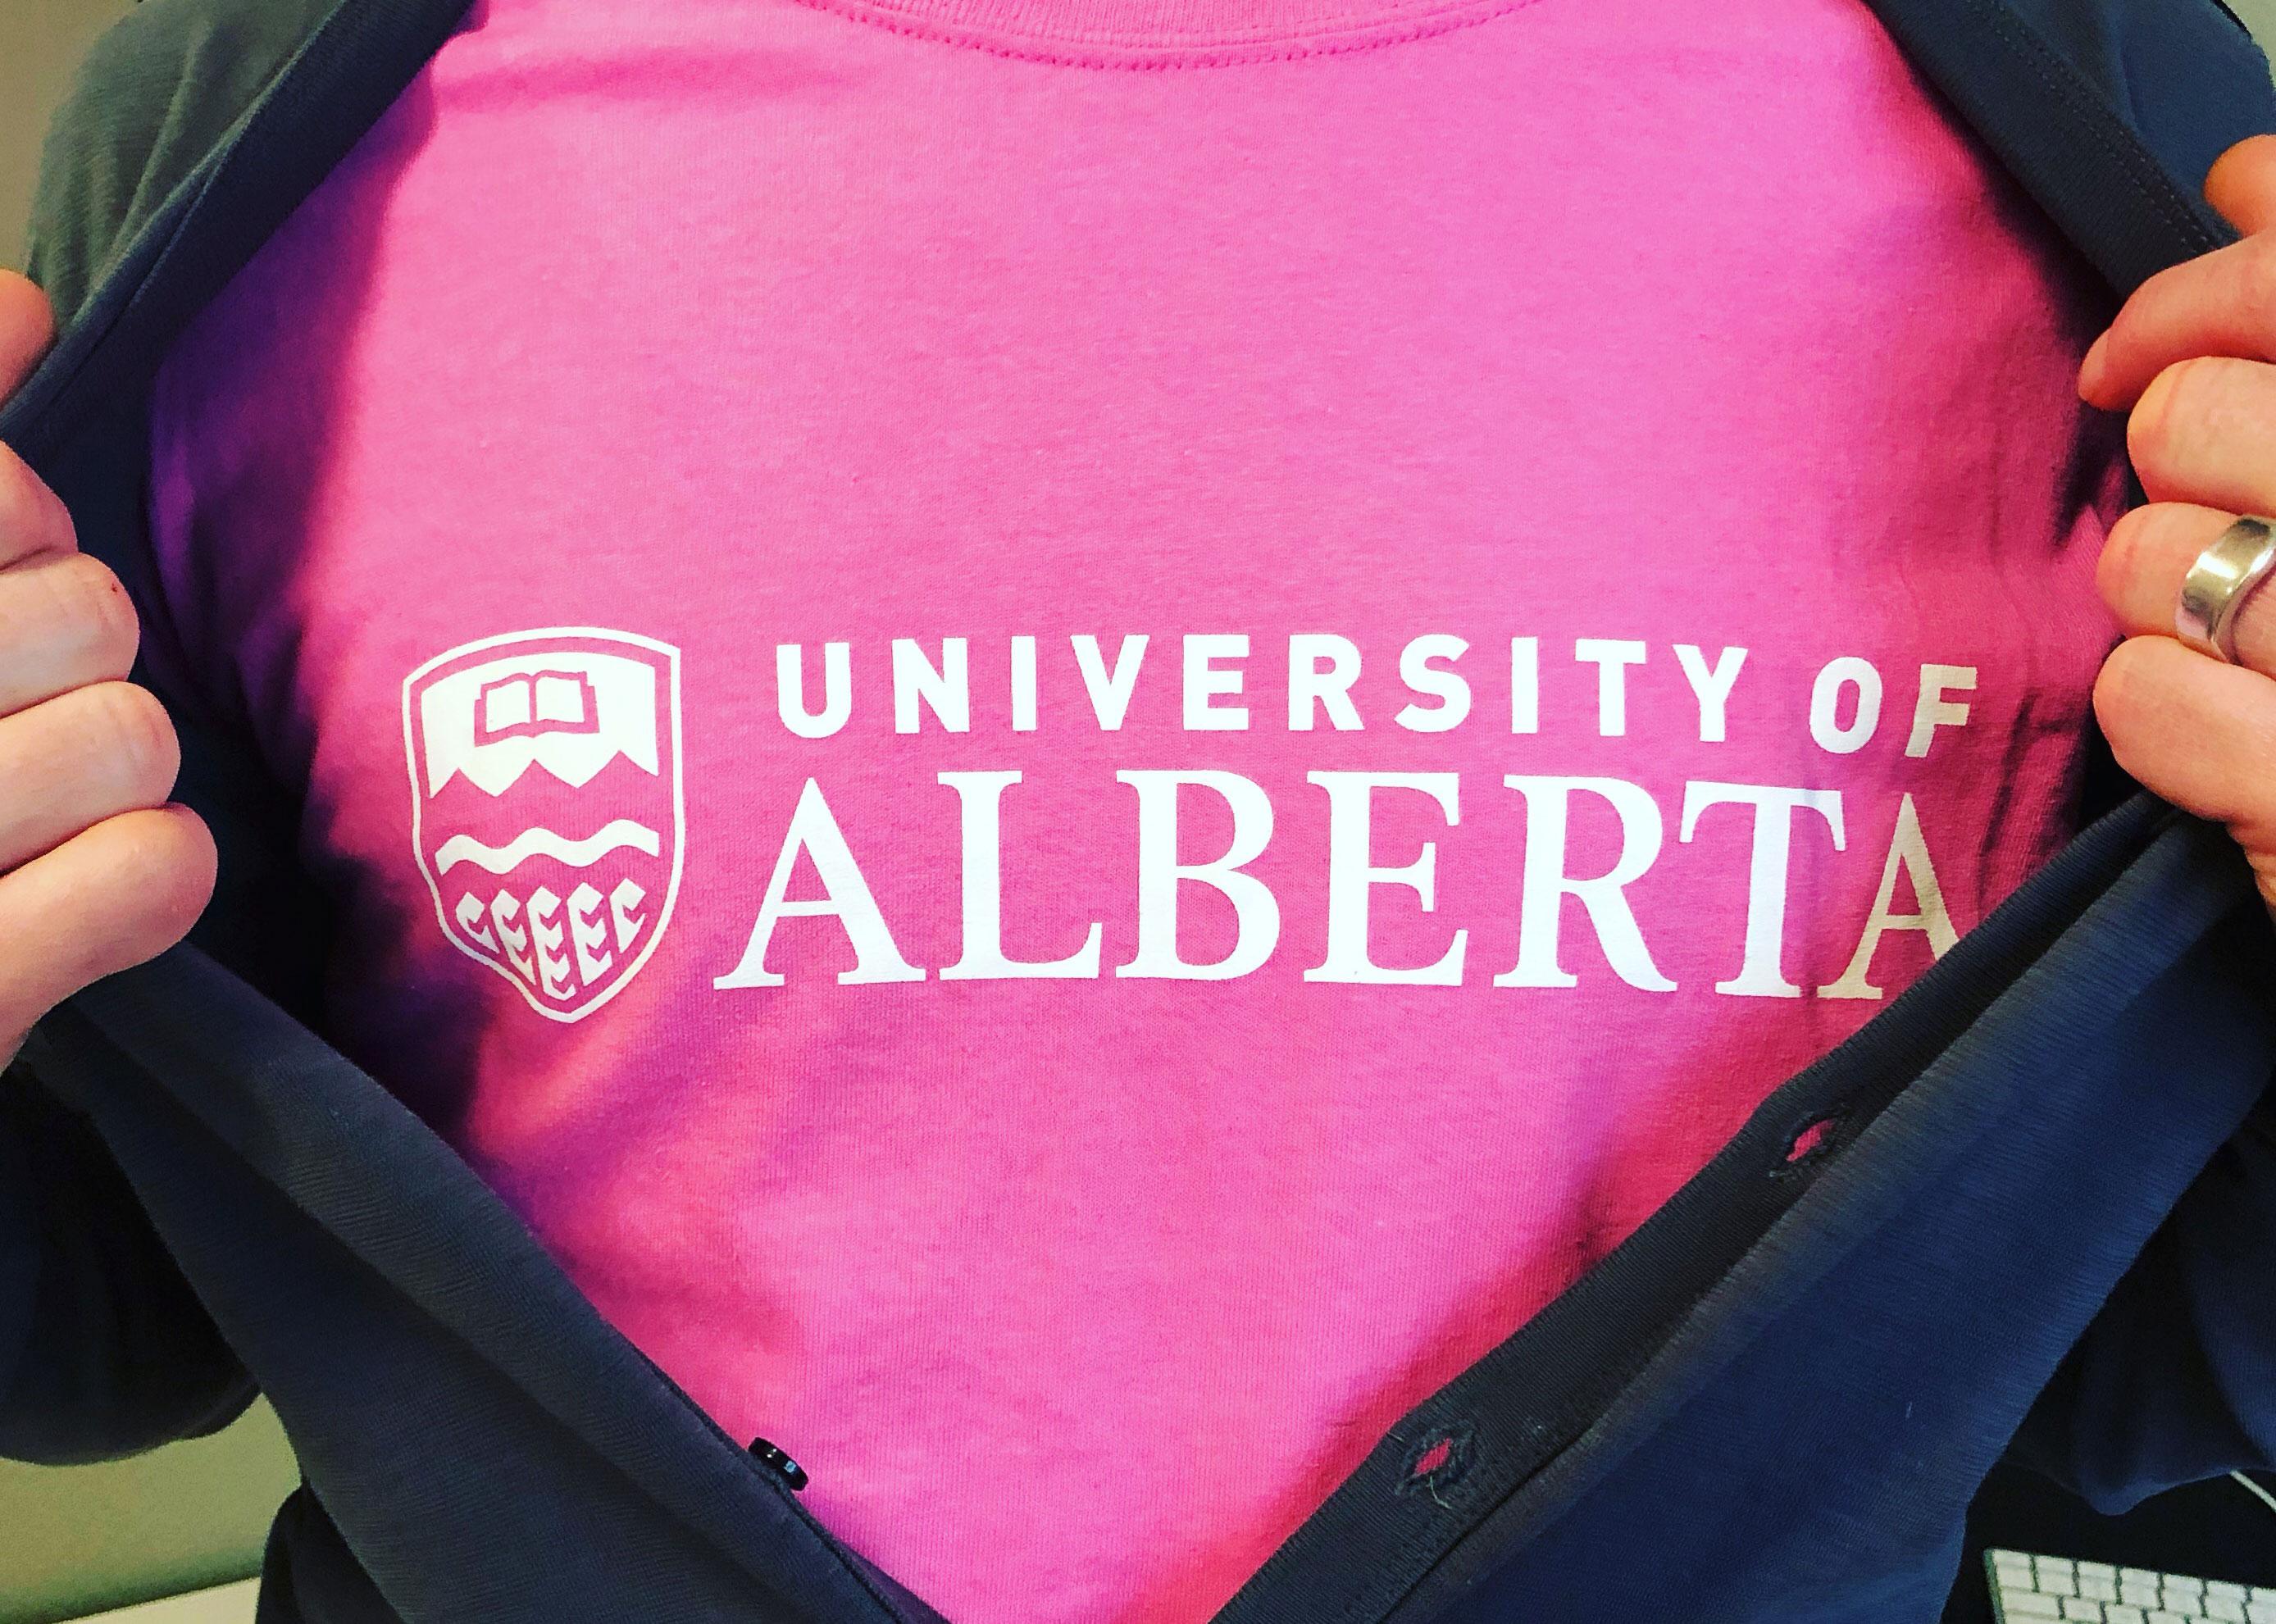 A Pink University of Alberta T-Shirt